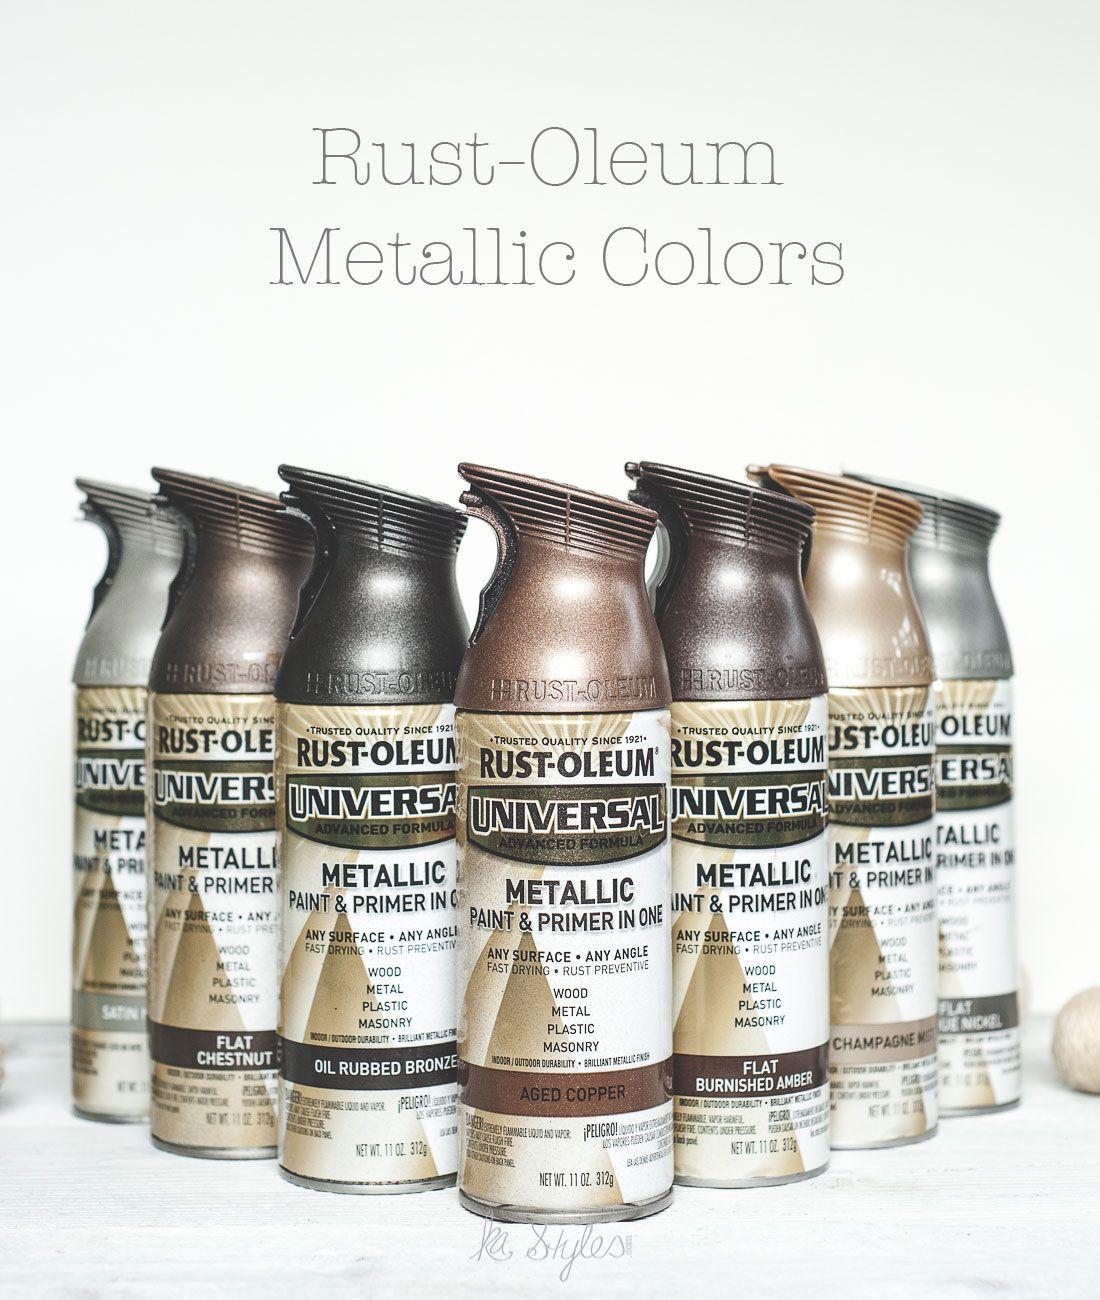 rust oleum metallic spray paints diy home metallic spray paint metallic spray paint colors. Black Bedroom Furniture Sets. Home Design Ideas